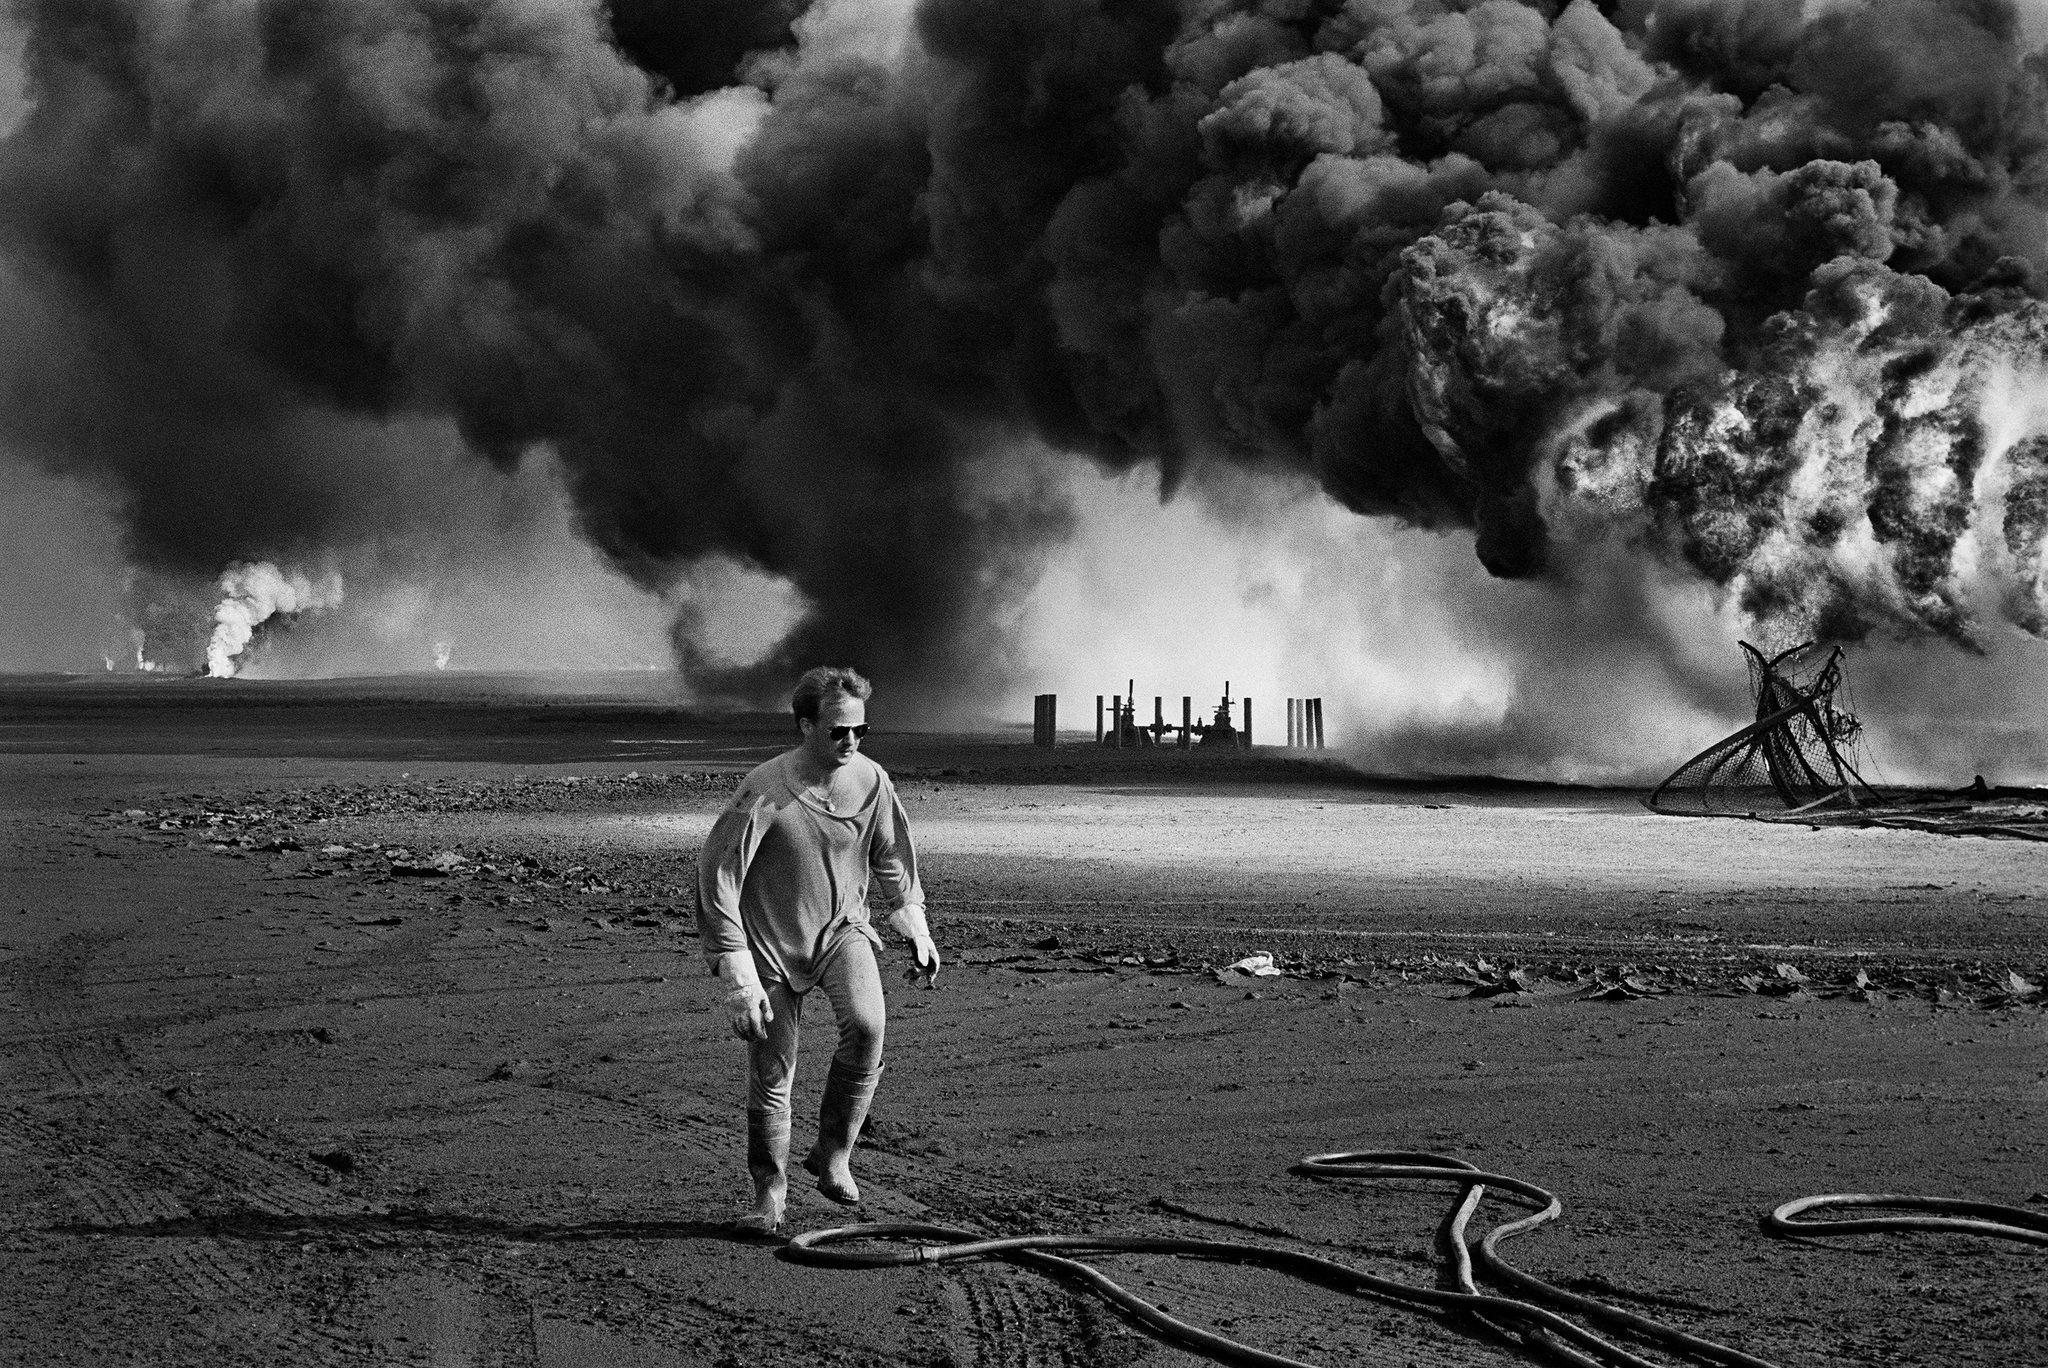 25th Anniversary Of 1991 Kuwaiti Oil Fires Published 2016 Sebastiao Salgado Sebastiao Salgados Photo